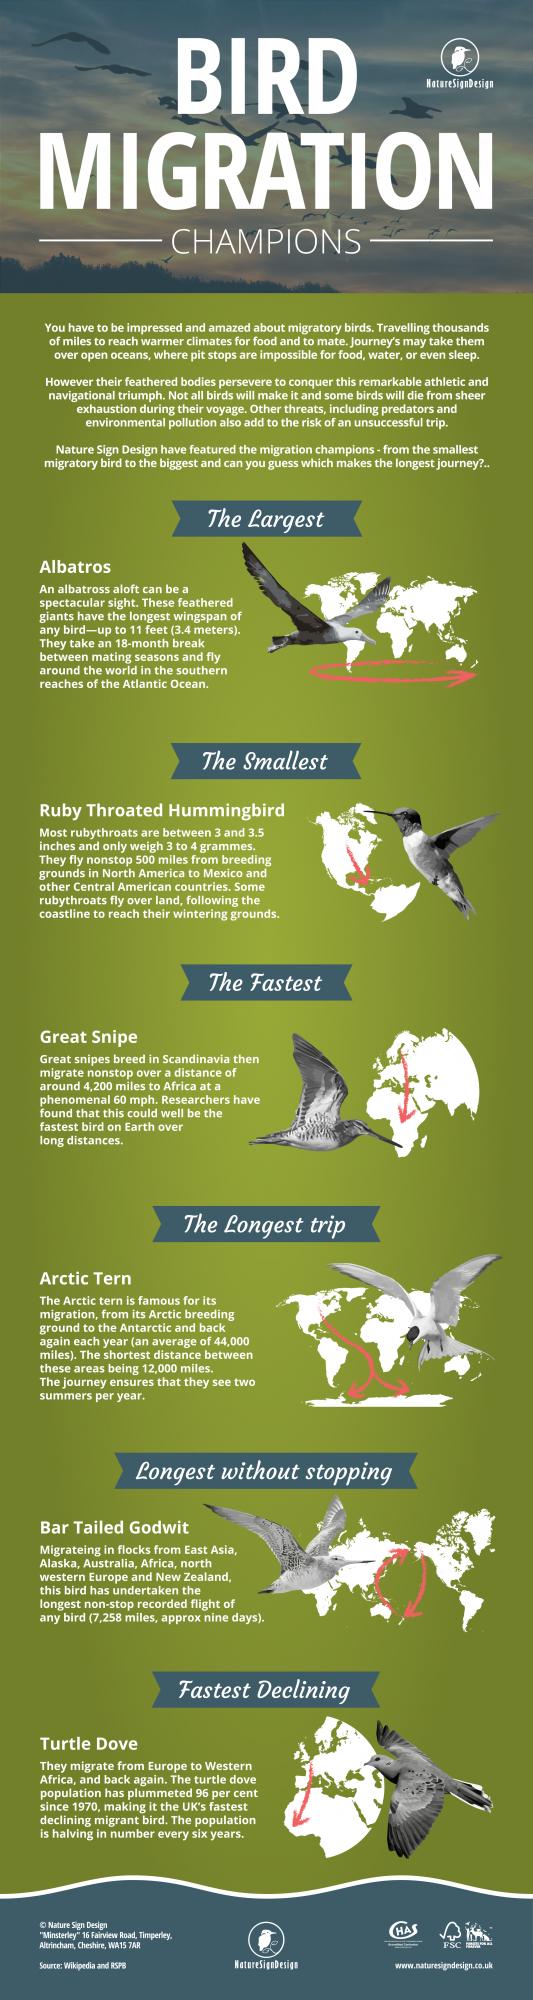 bird migration infographic